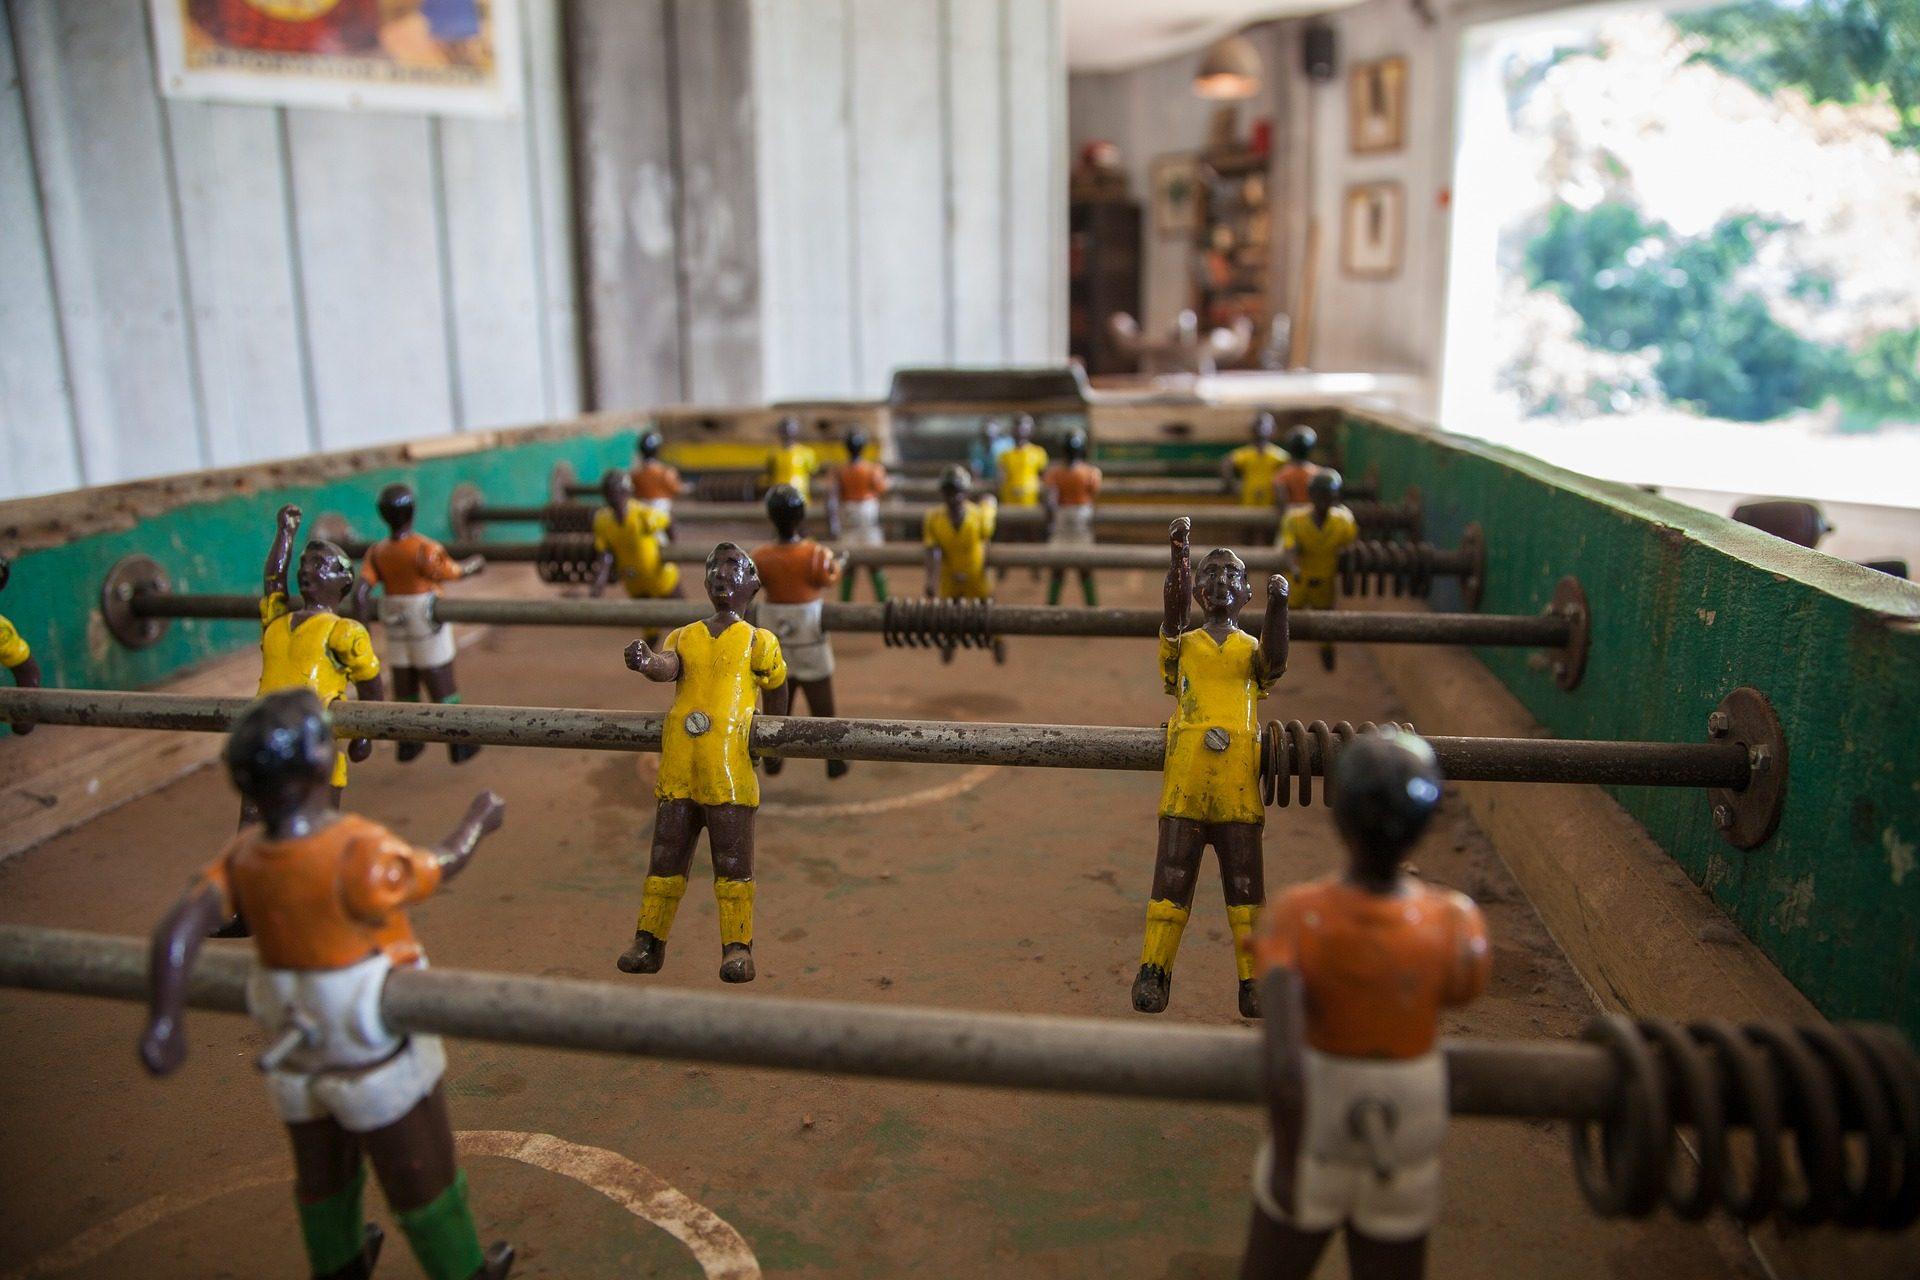 futbolín, 足球, 娃娃, 数字, 酒吧, 非洲 - 高清壁纸 - 教授-falken.com